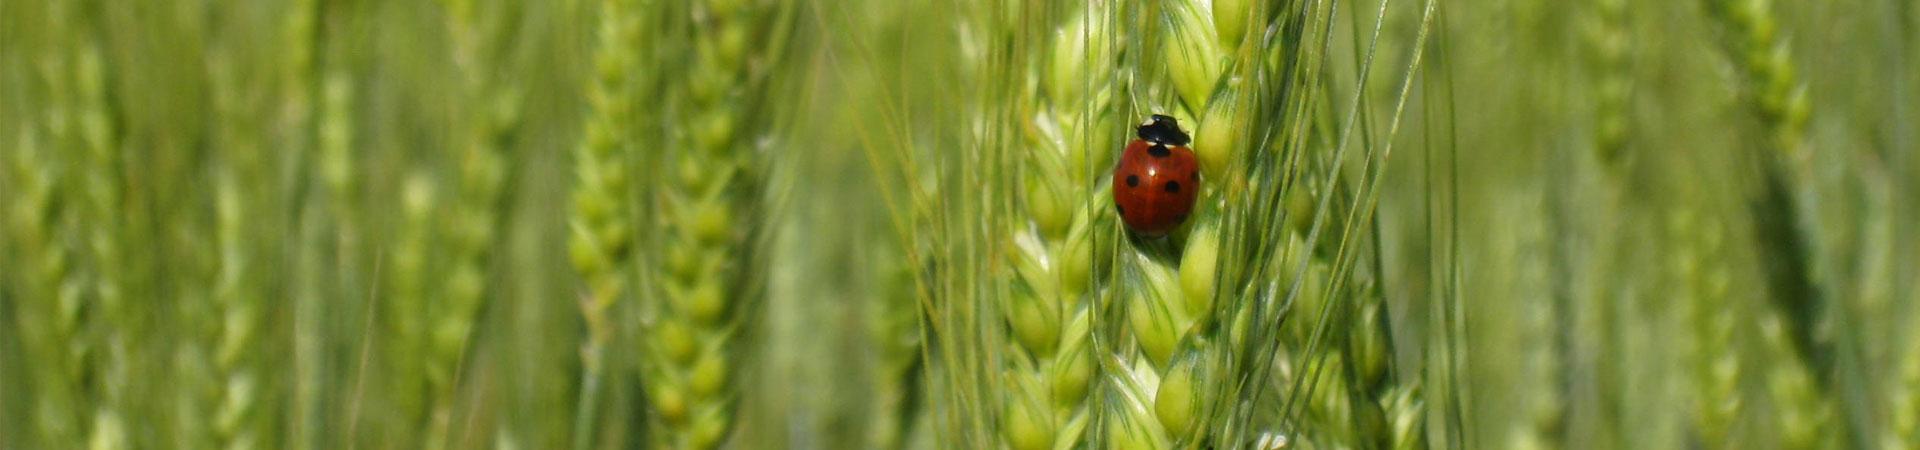 bandeau-agroecology-4